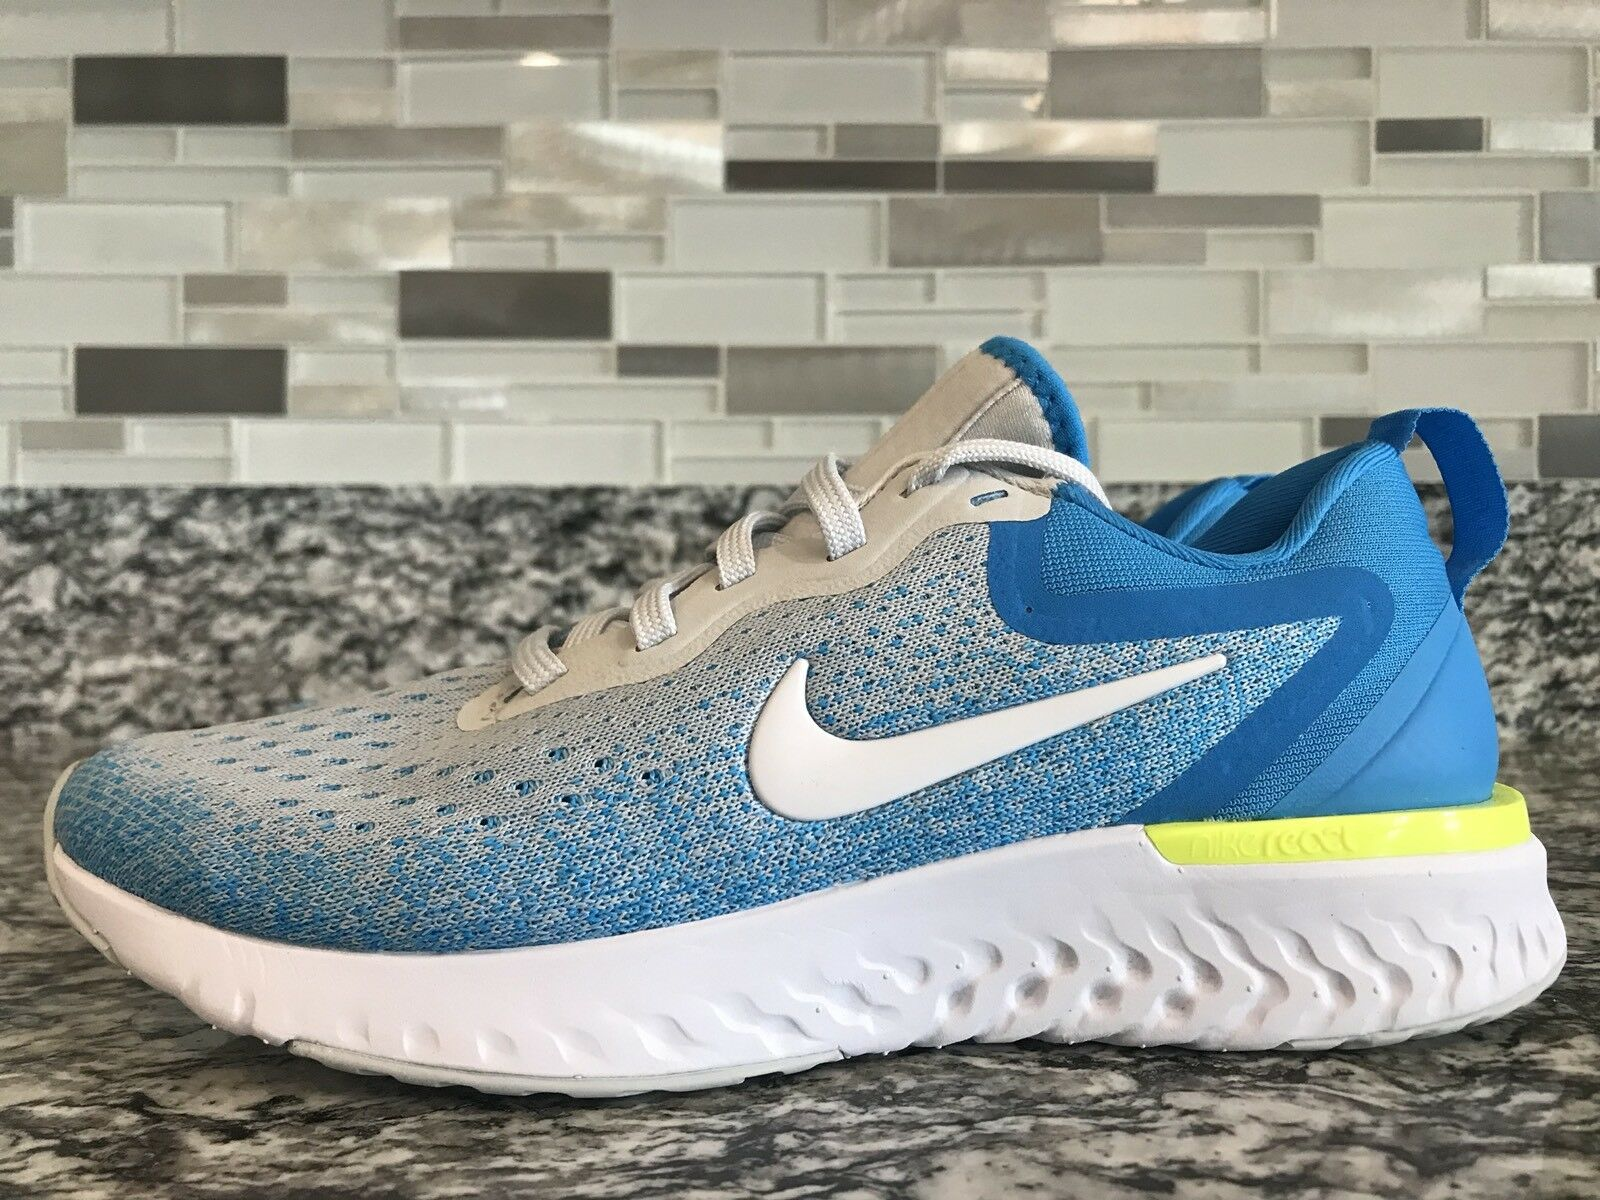 Brand New WMNS Sz 6 Nike Odyssey React AO9820-005 Wolf Grey White